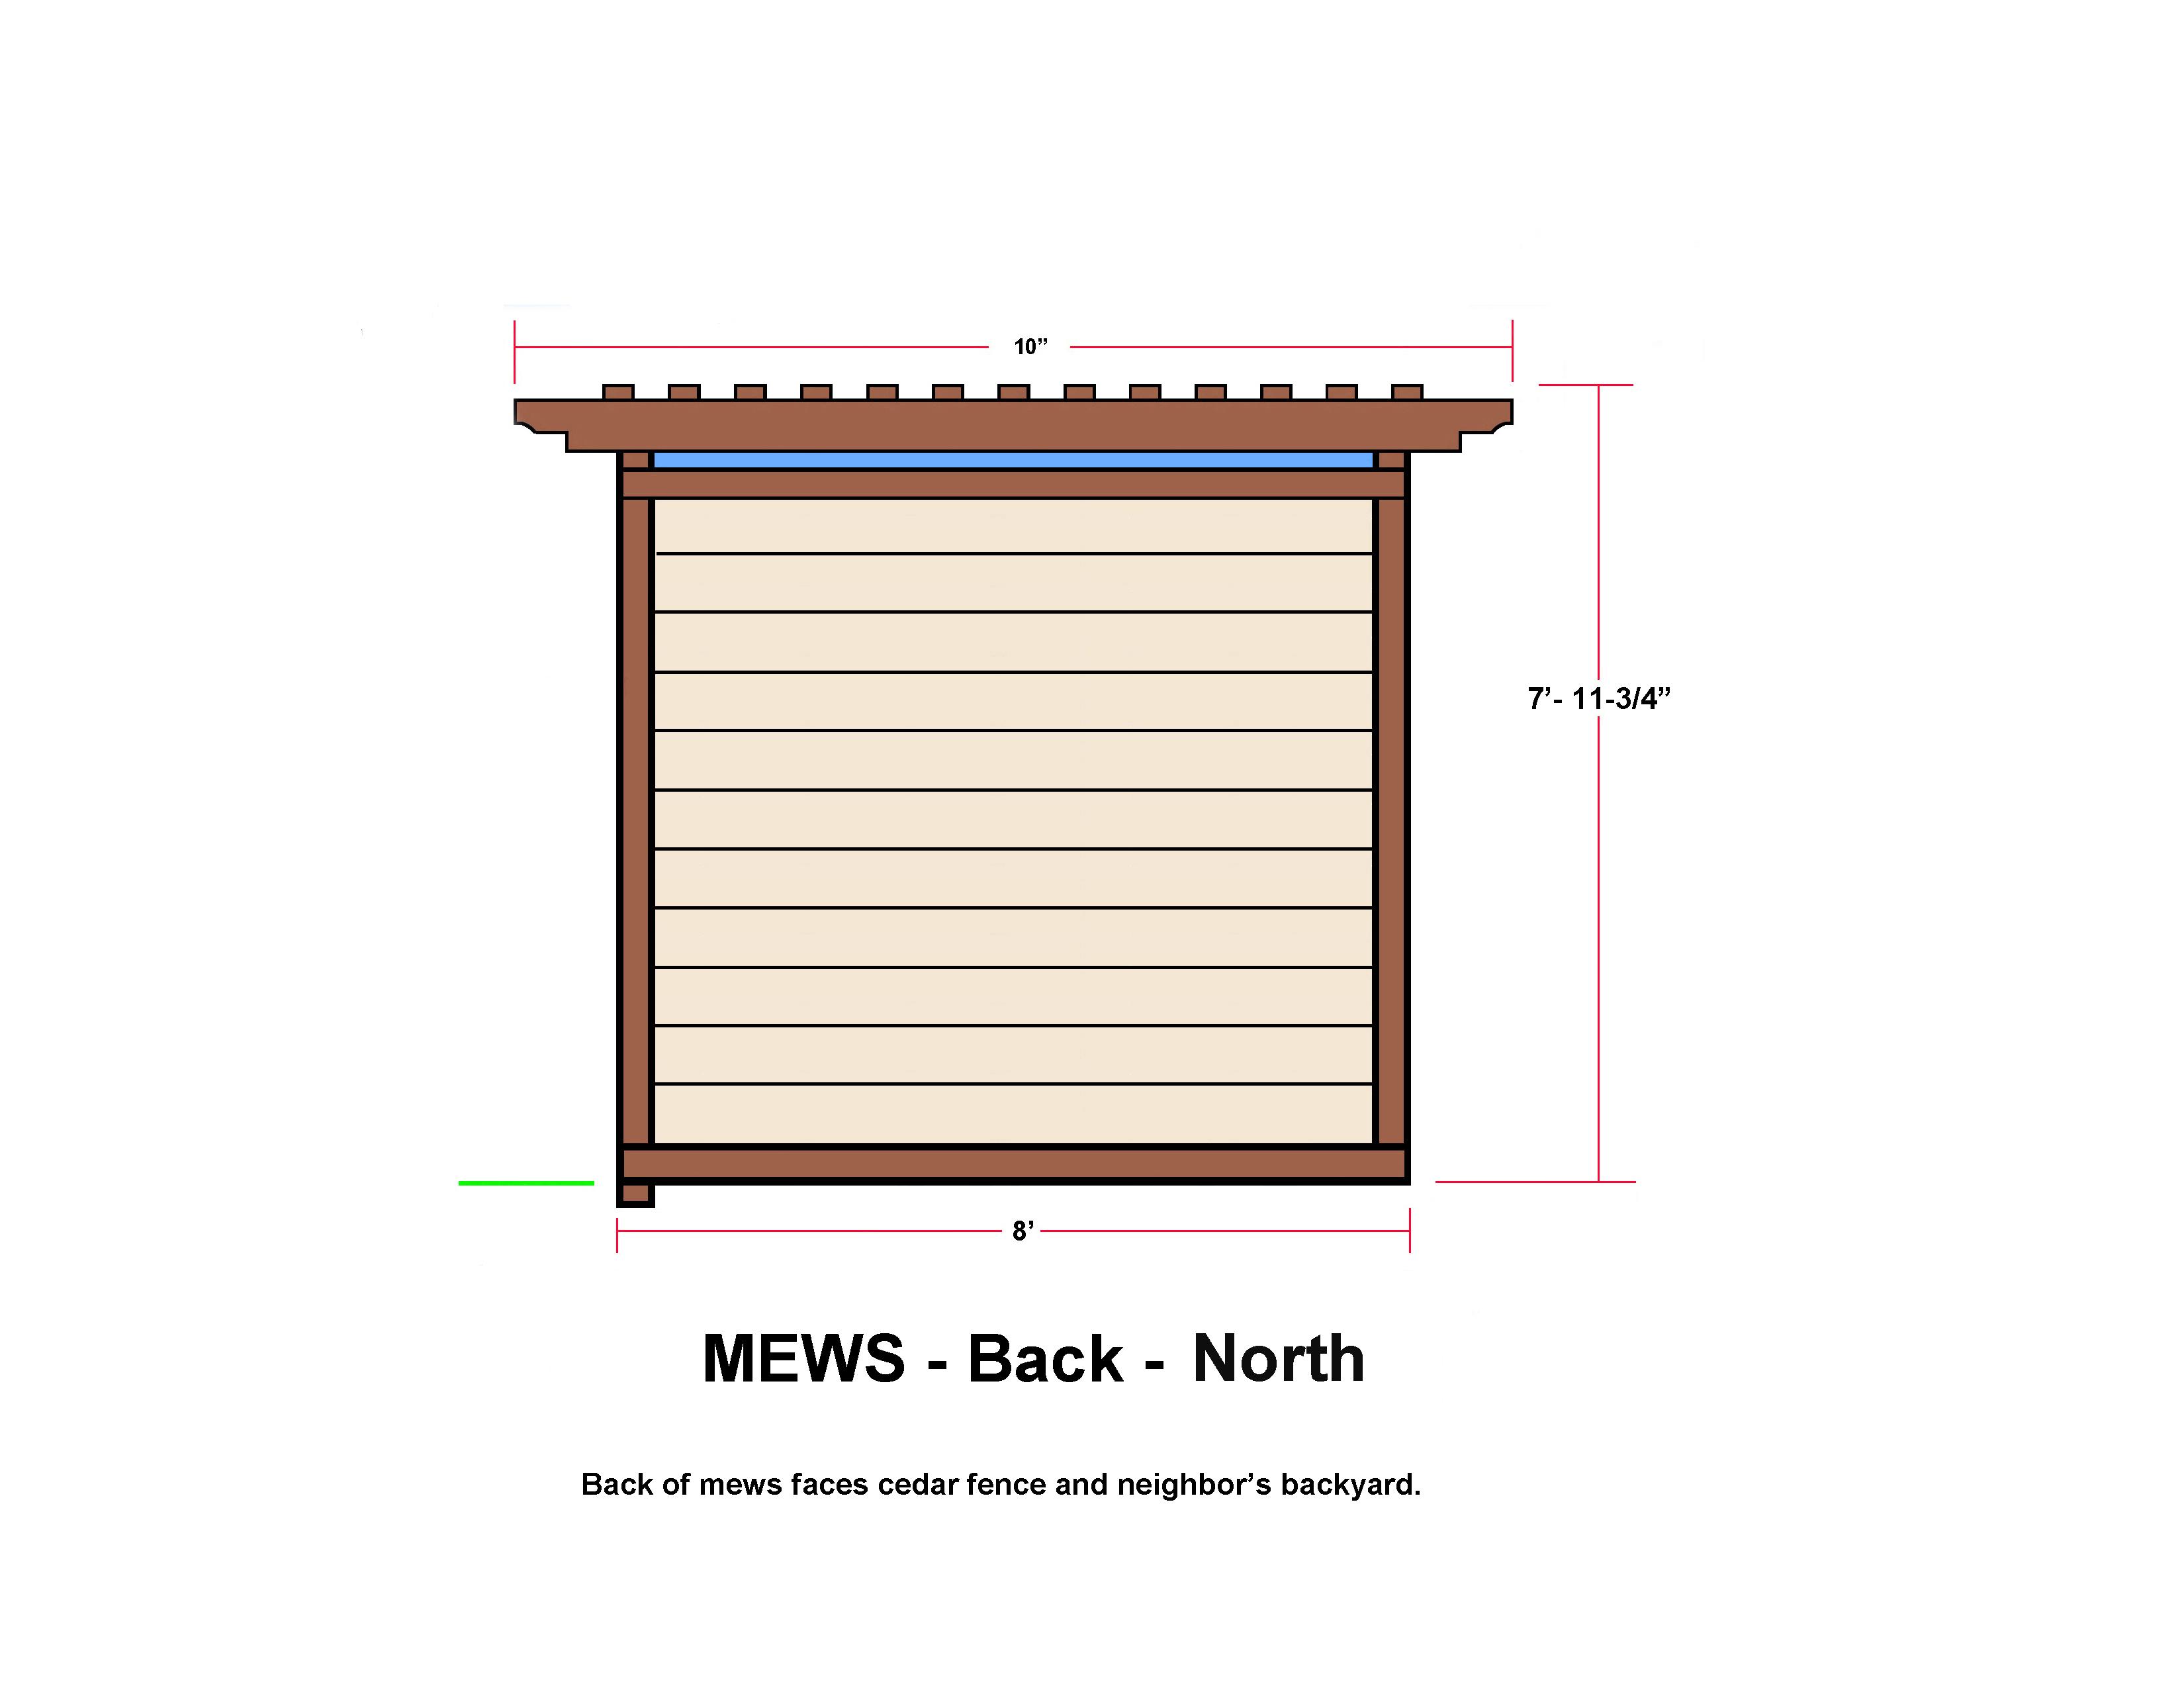 MEWS - Back - North